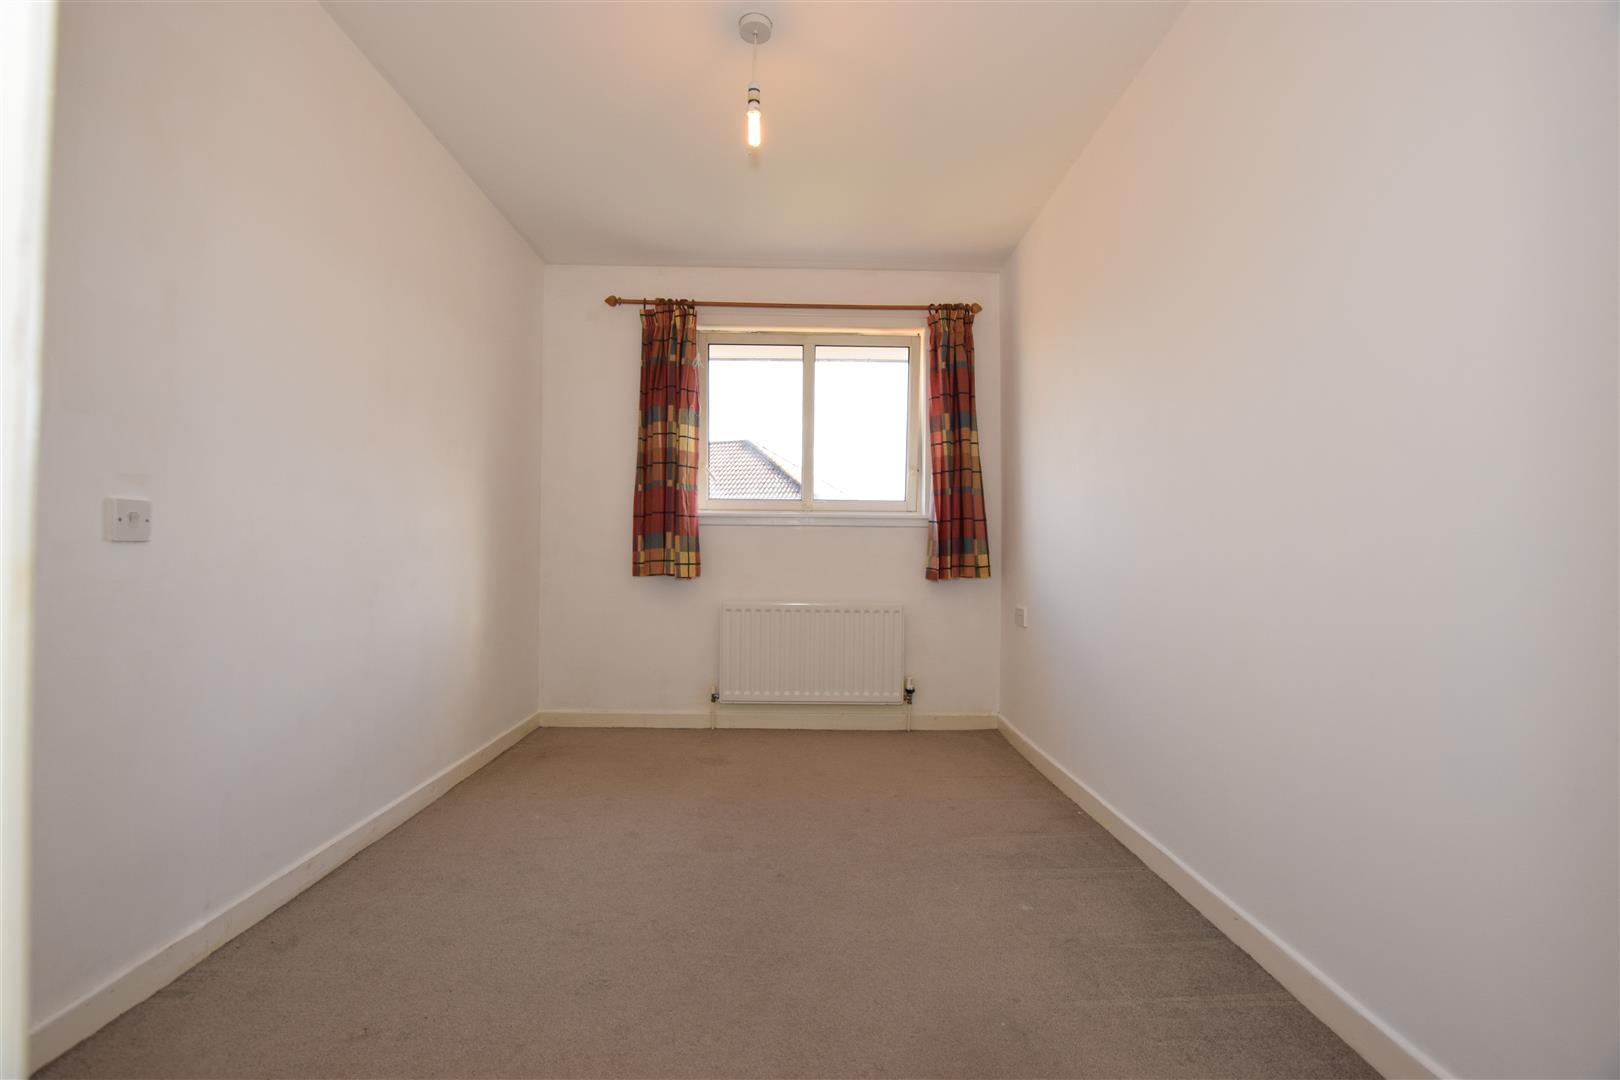 14, Gorse Loan, Perth, Perthshire, PH1 2SE, UK